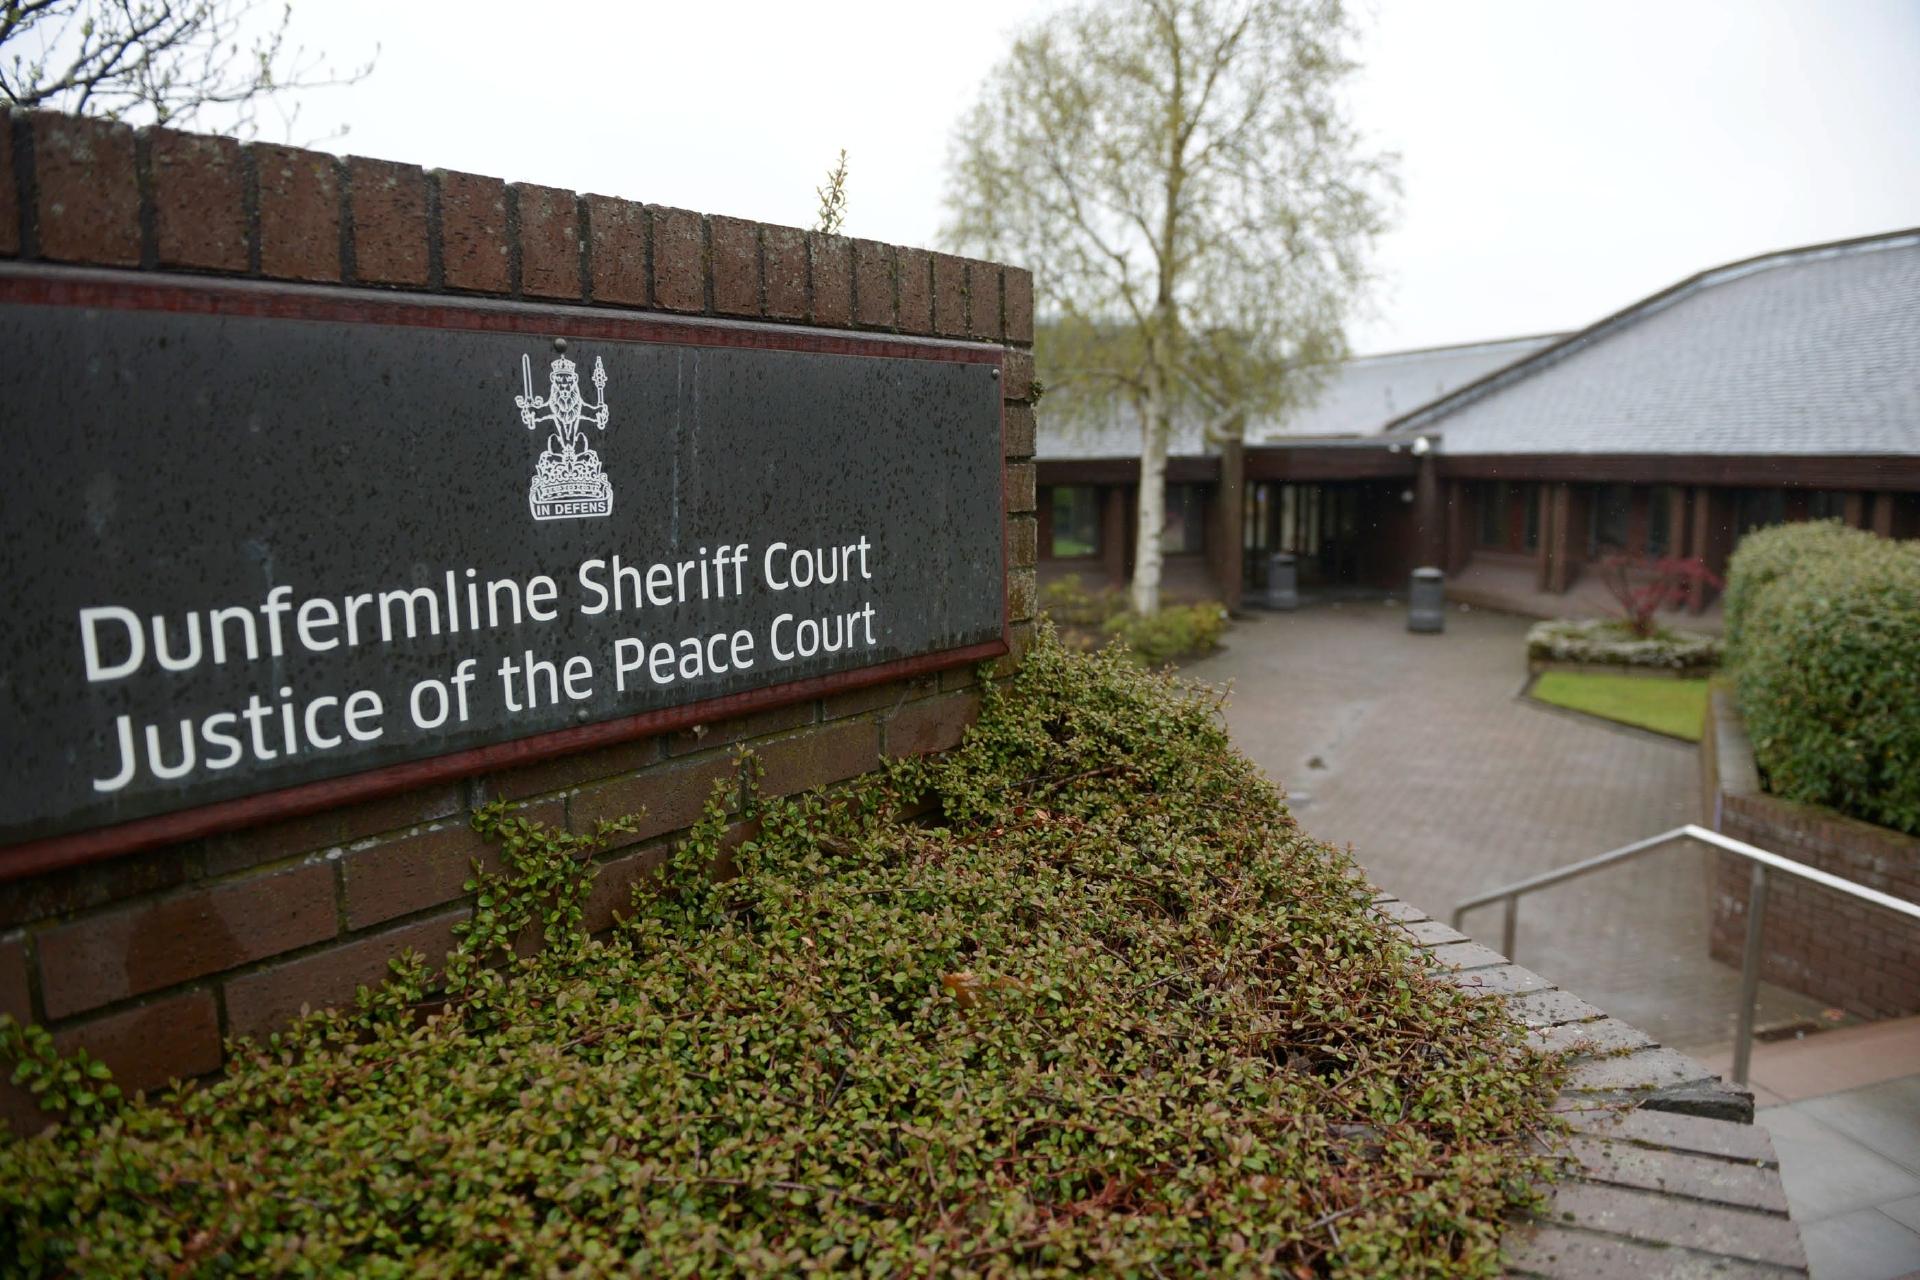 Dunfermline Sheriff Court.